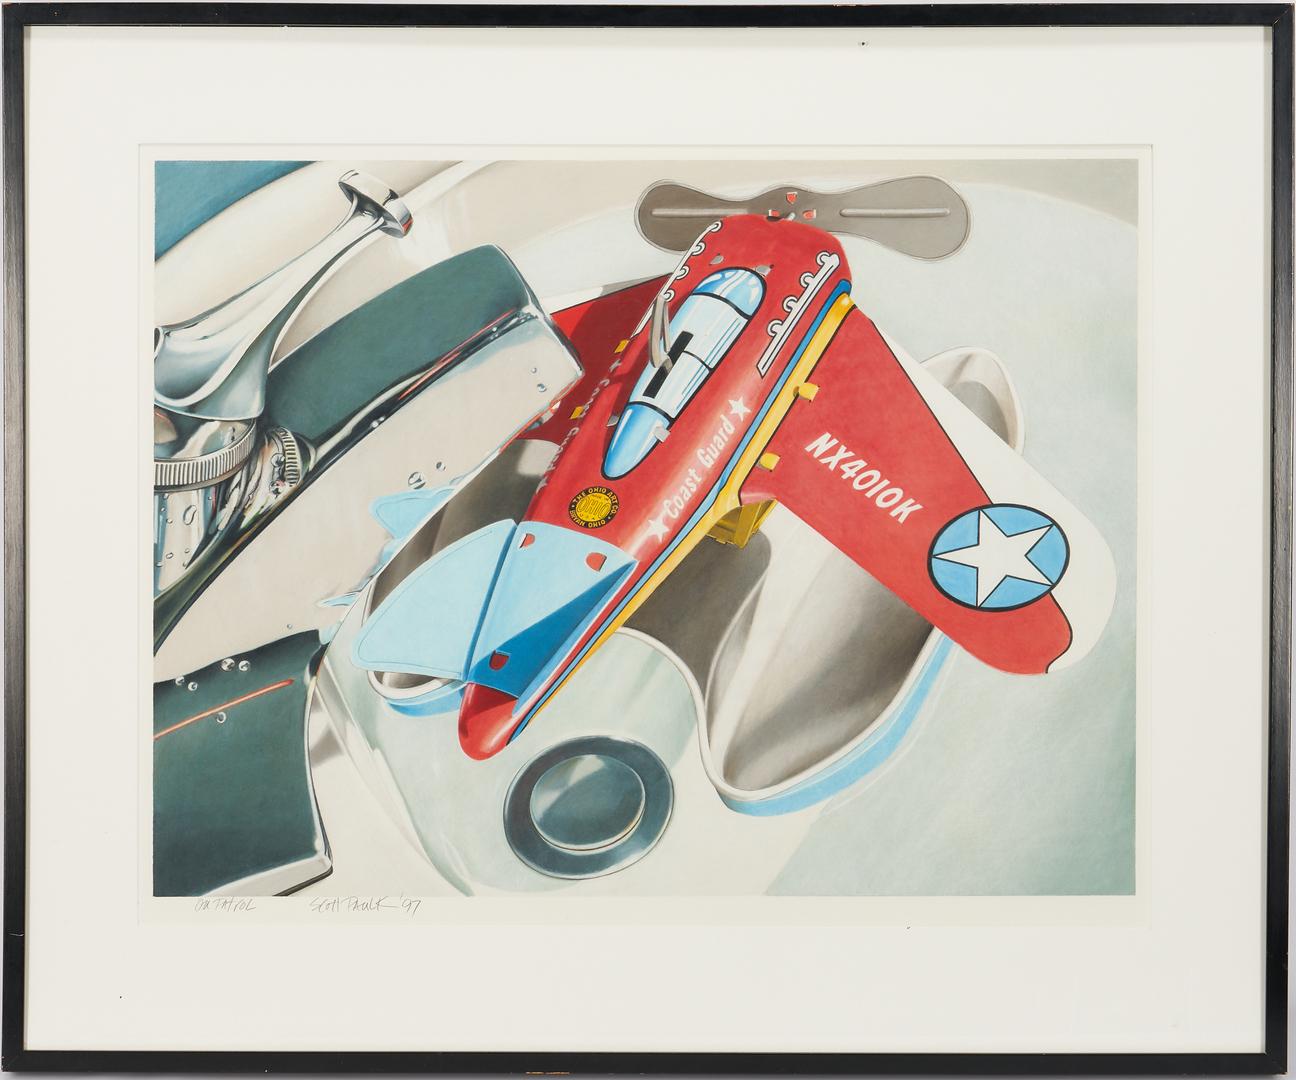 Lot 901: Exhibited Scott Paulk Drawing, On Patrol